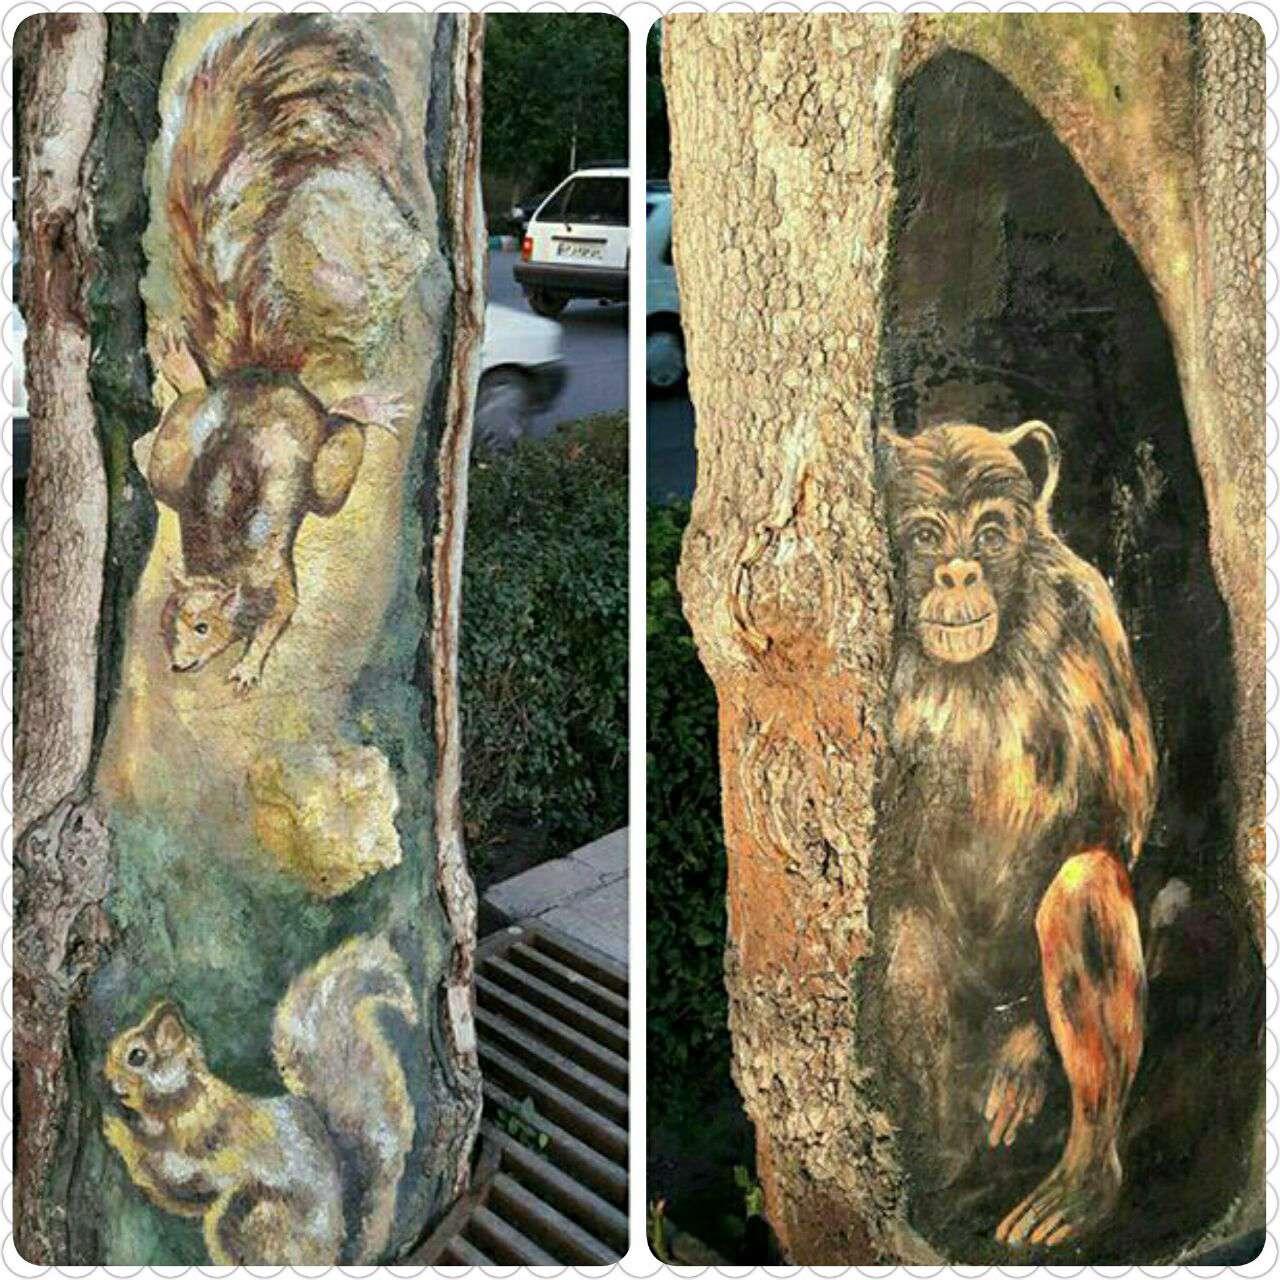 طراحی جالب روی درخت